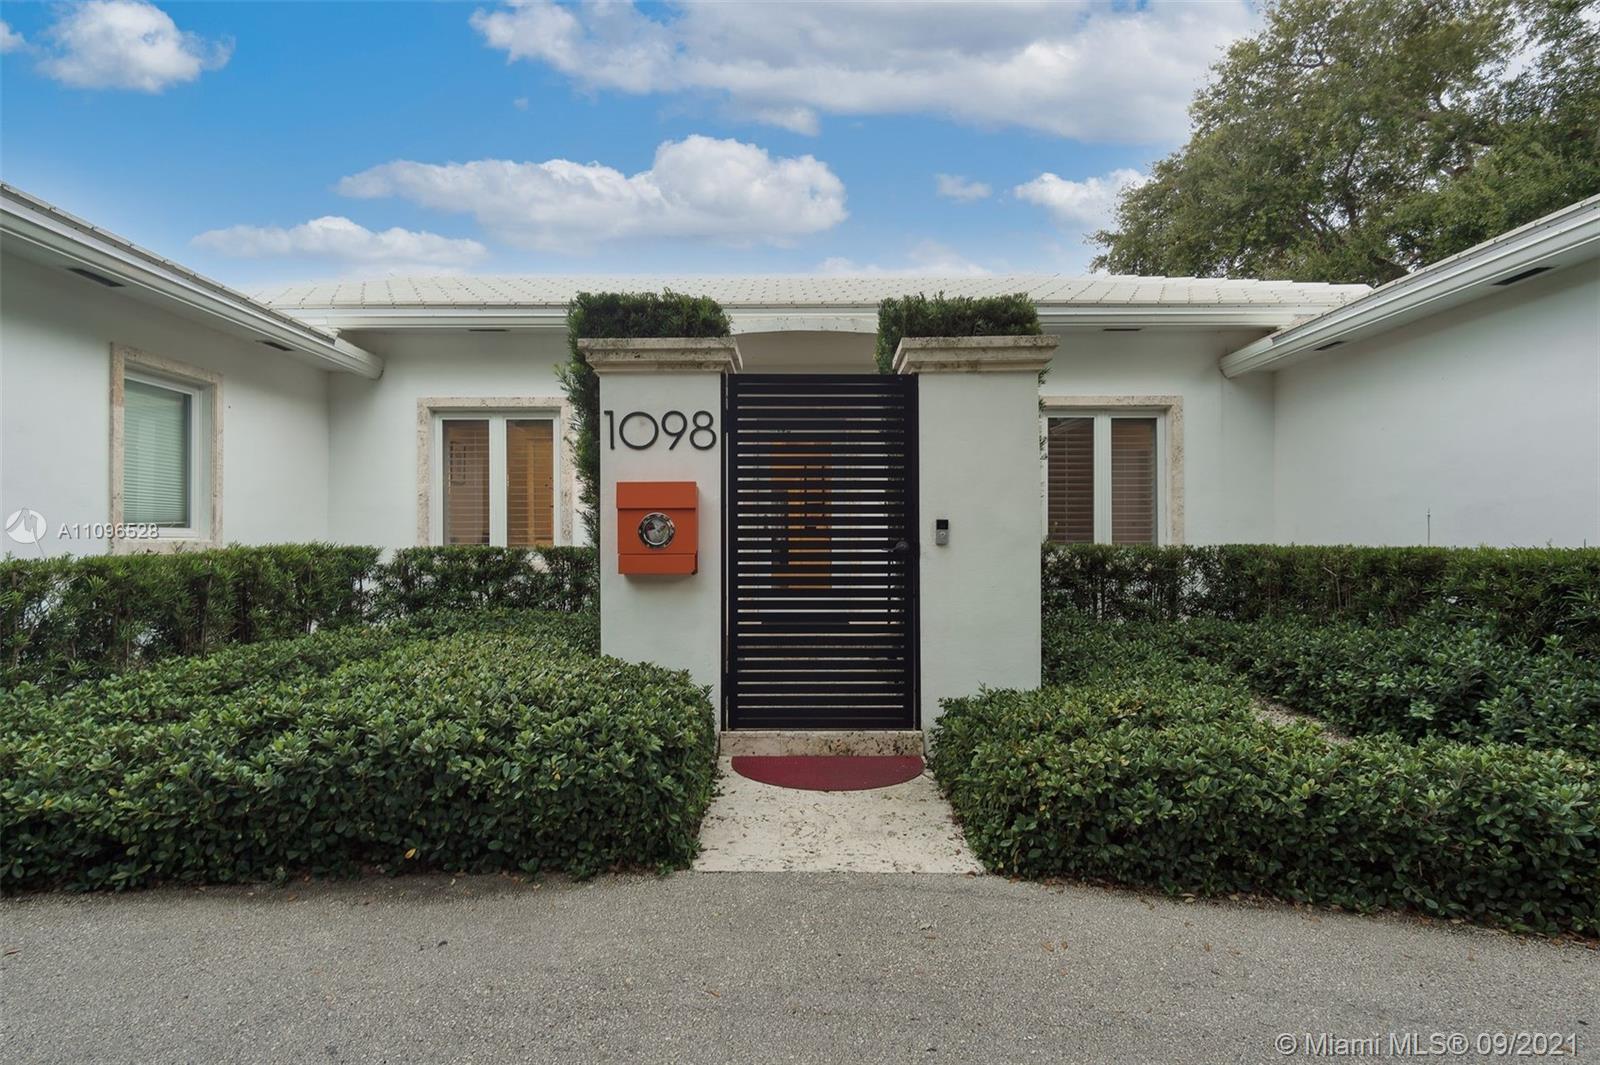 1098 99th St, Miami Shores, Florida 33138